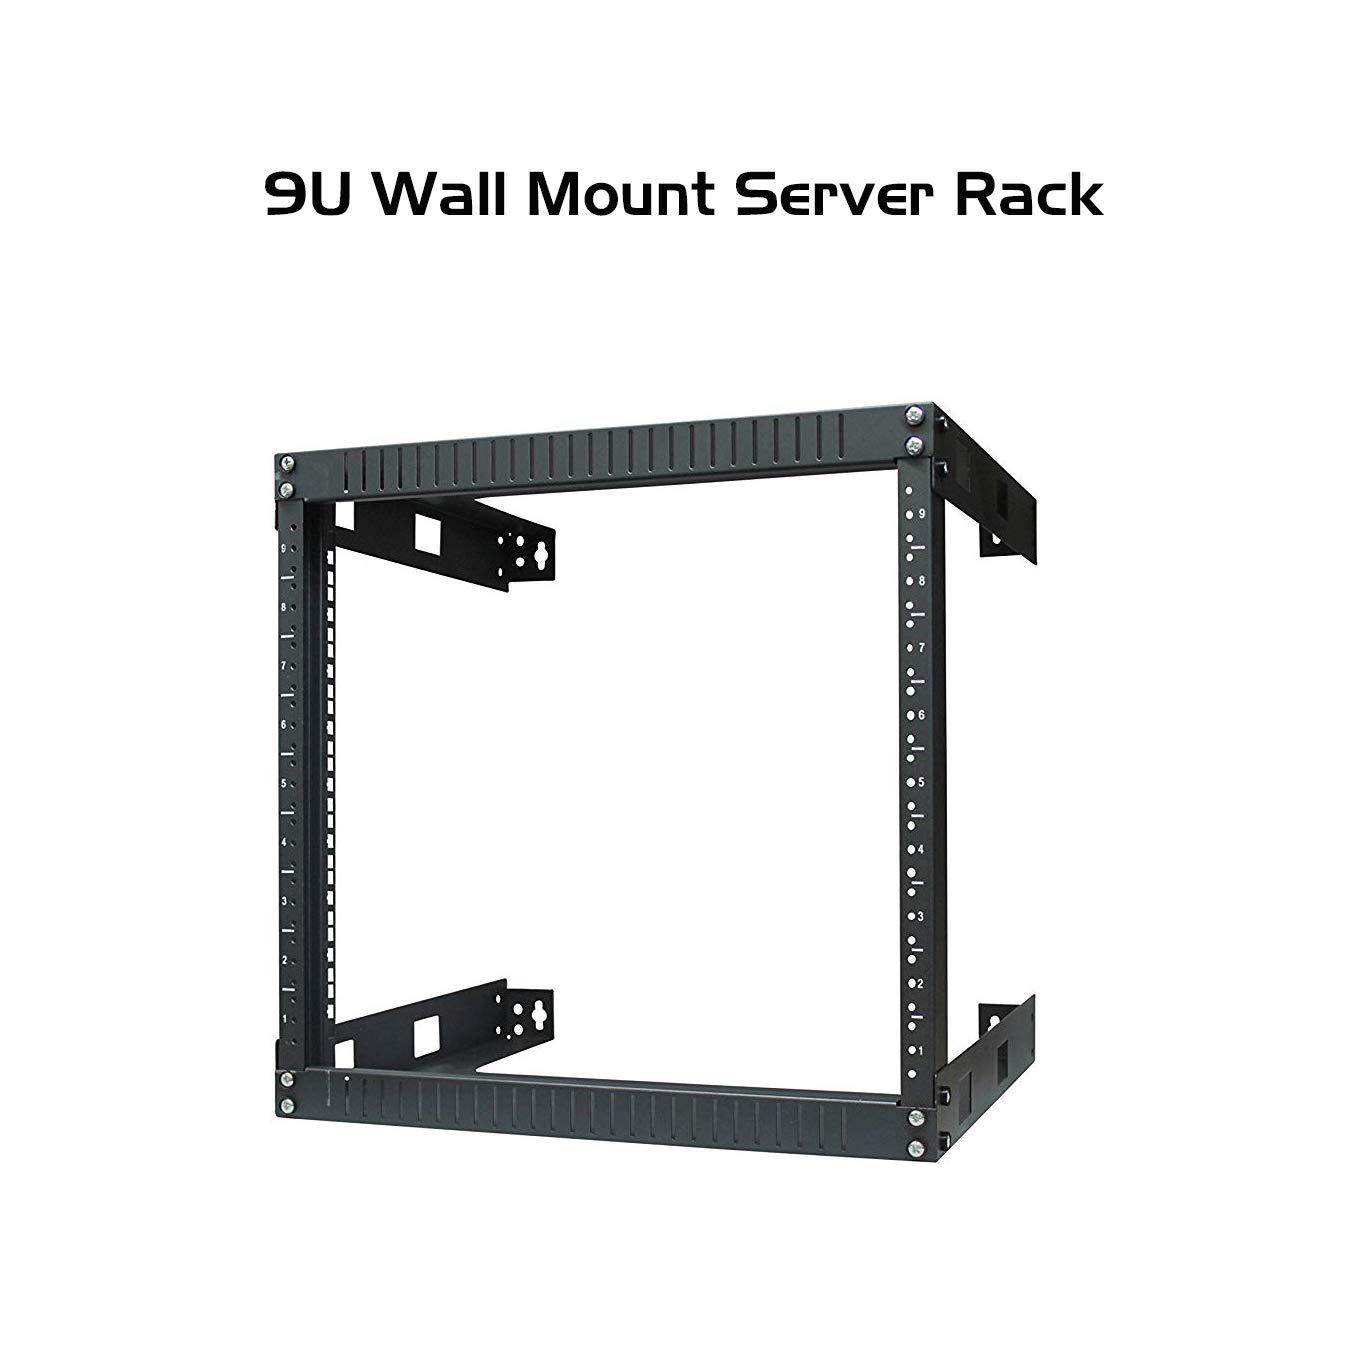 "Ares Vision 9U Steel Wall Mount, Open Air Frame,19"" Wide Server Equipment Rack (9U)"